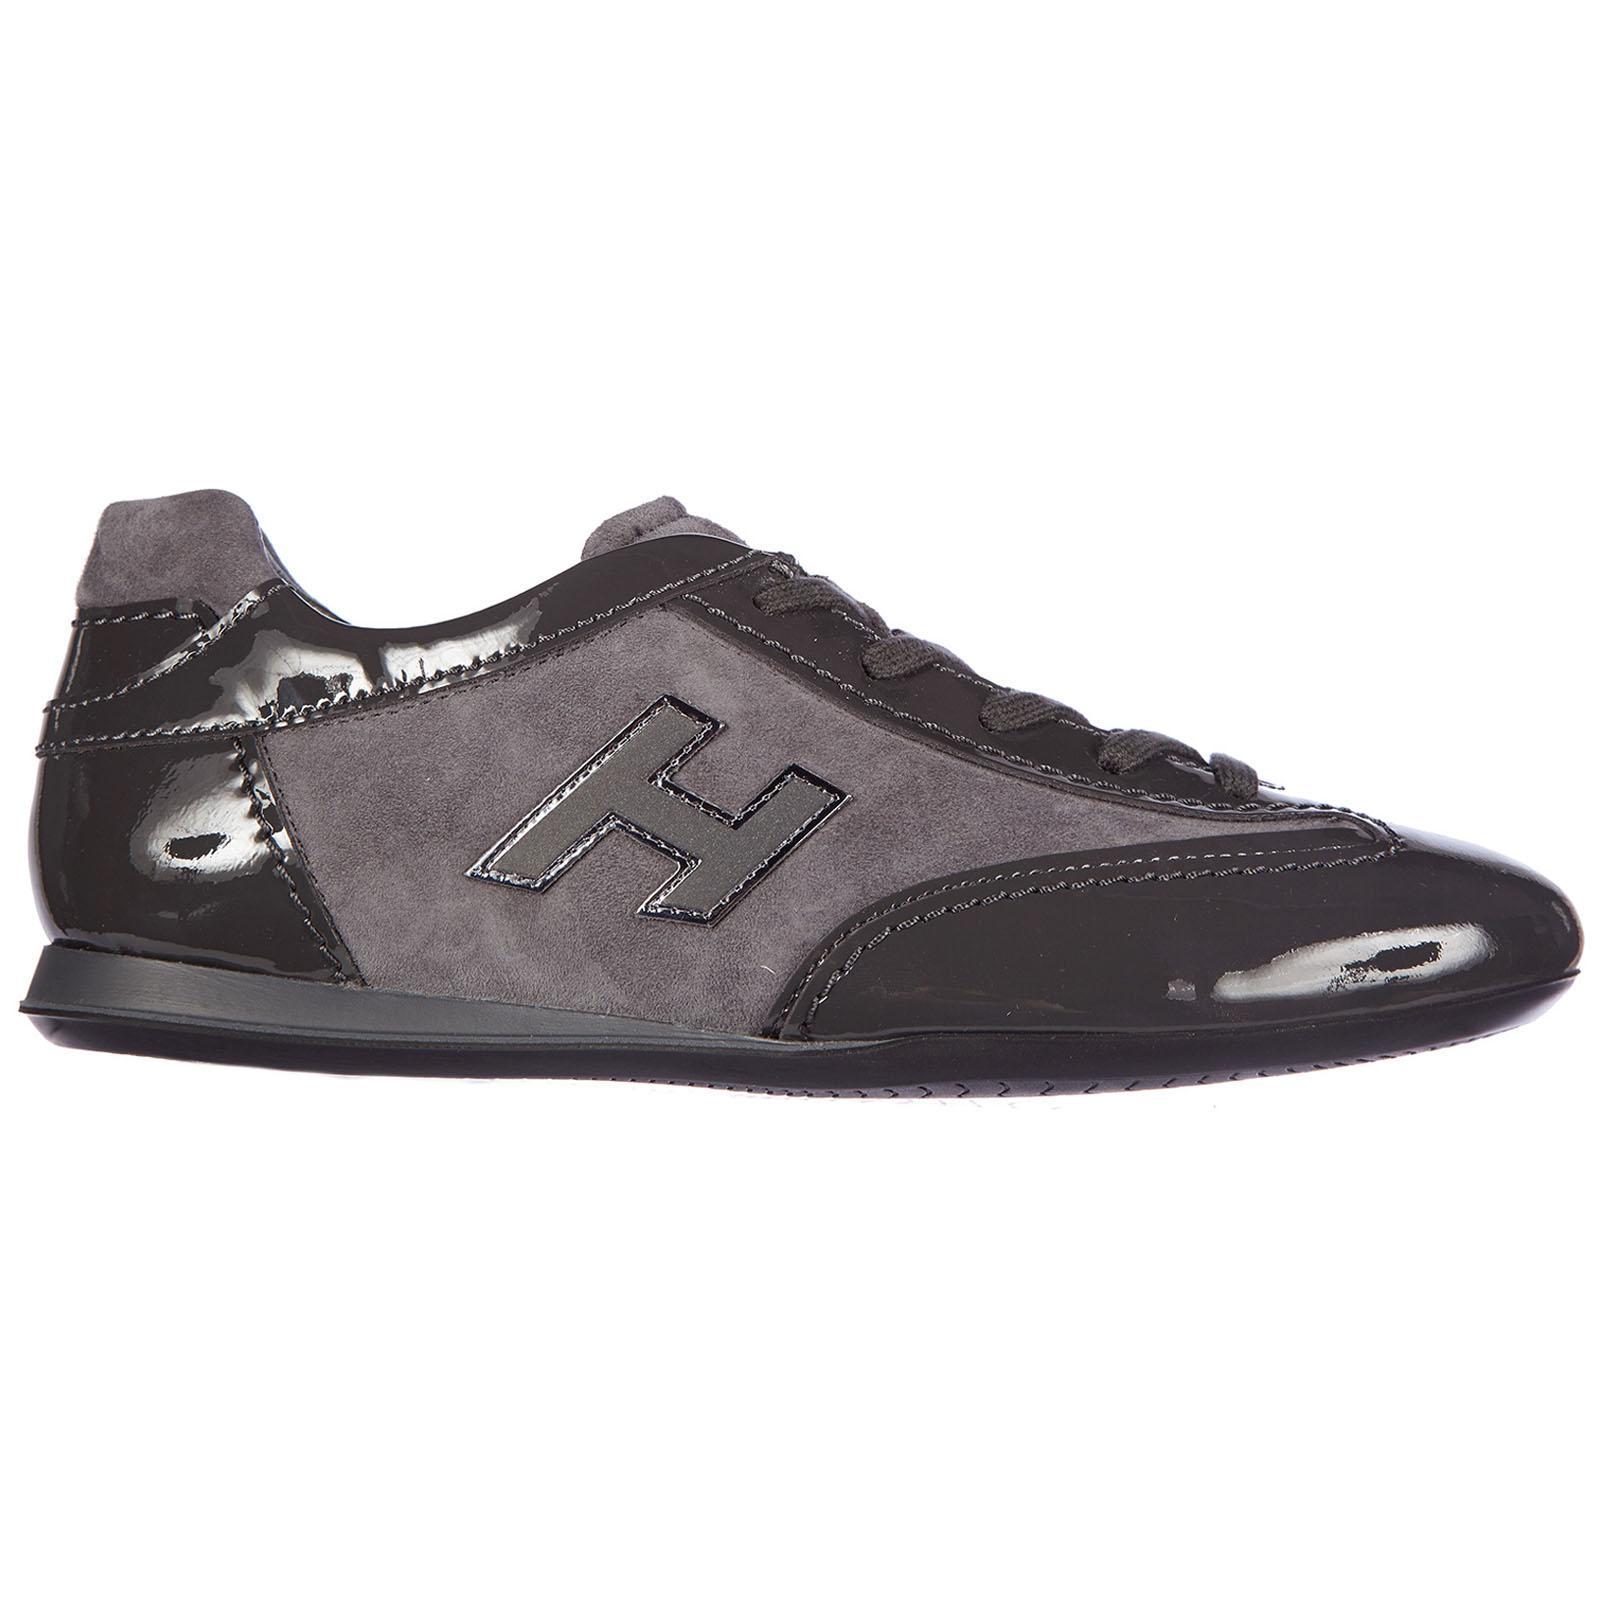 Lyst - Hogan Scarpe Sneakers Donna In Pelle Olympia H Flock 65fd44d816f